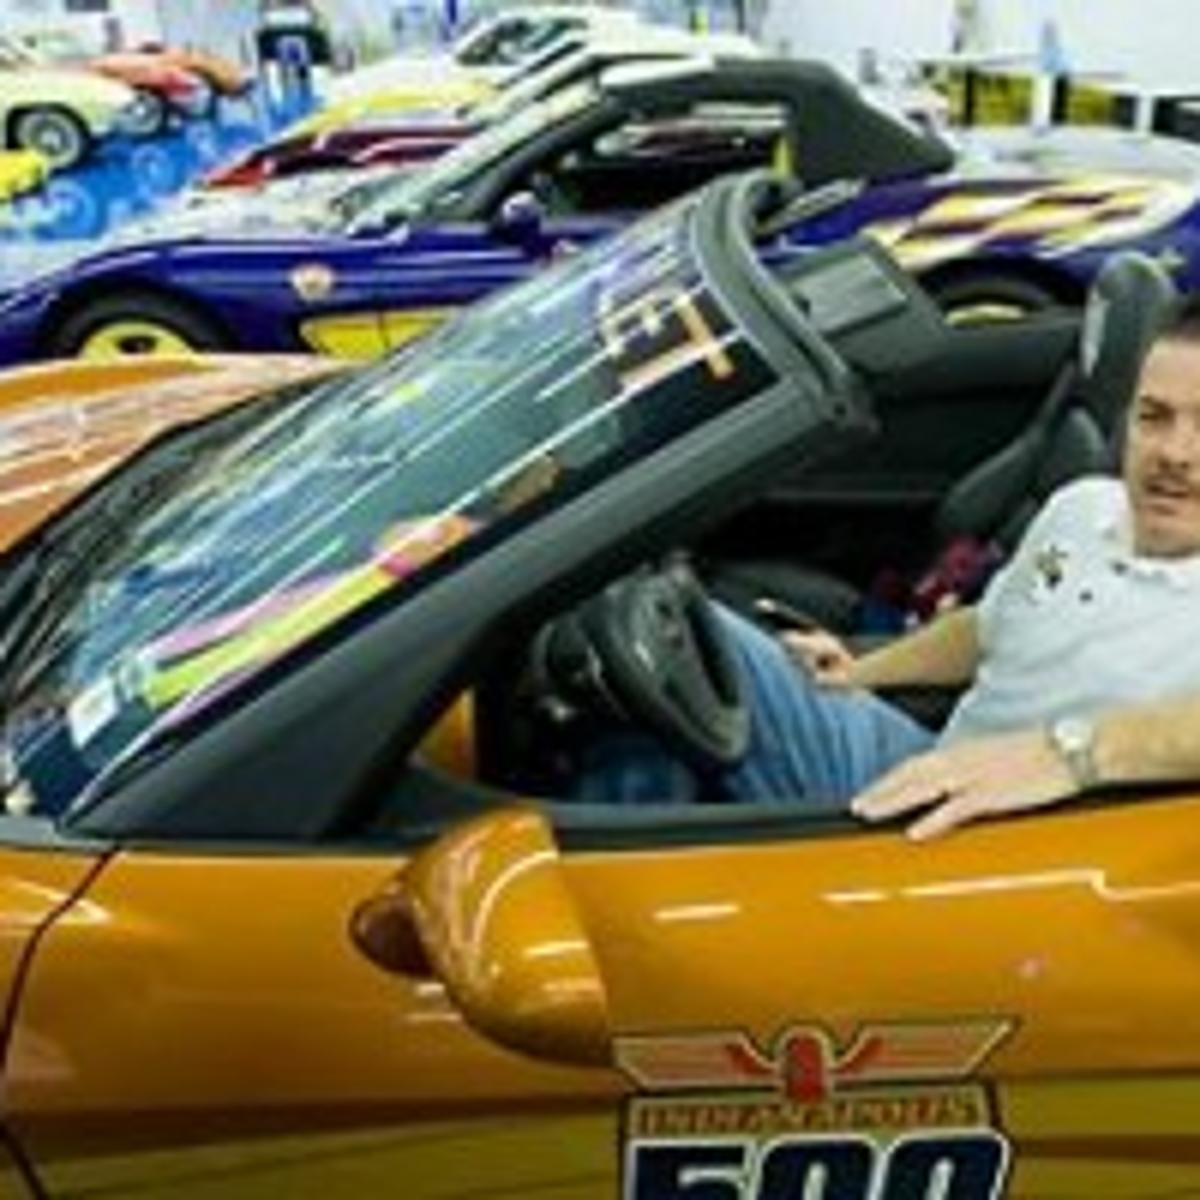 Car Dealerships Decatur Il >> Metallic Dreams Decatur Businessman To Open Chevrolet Hall